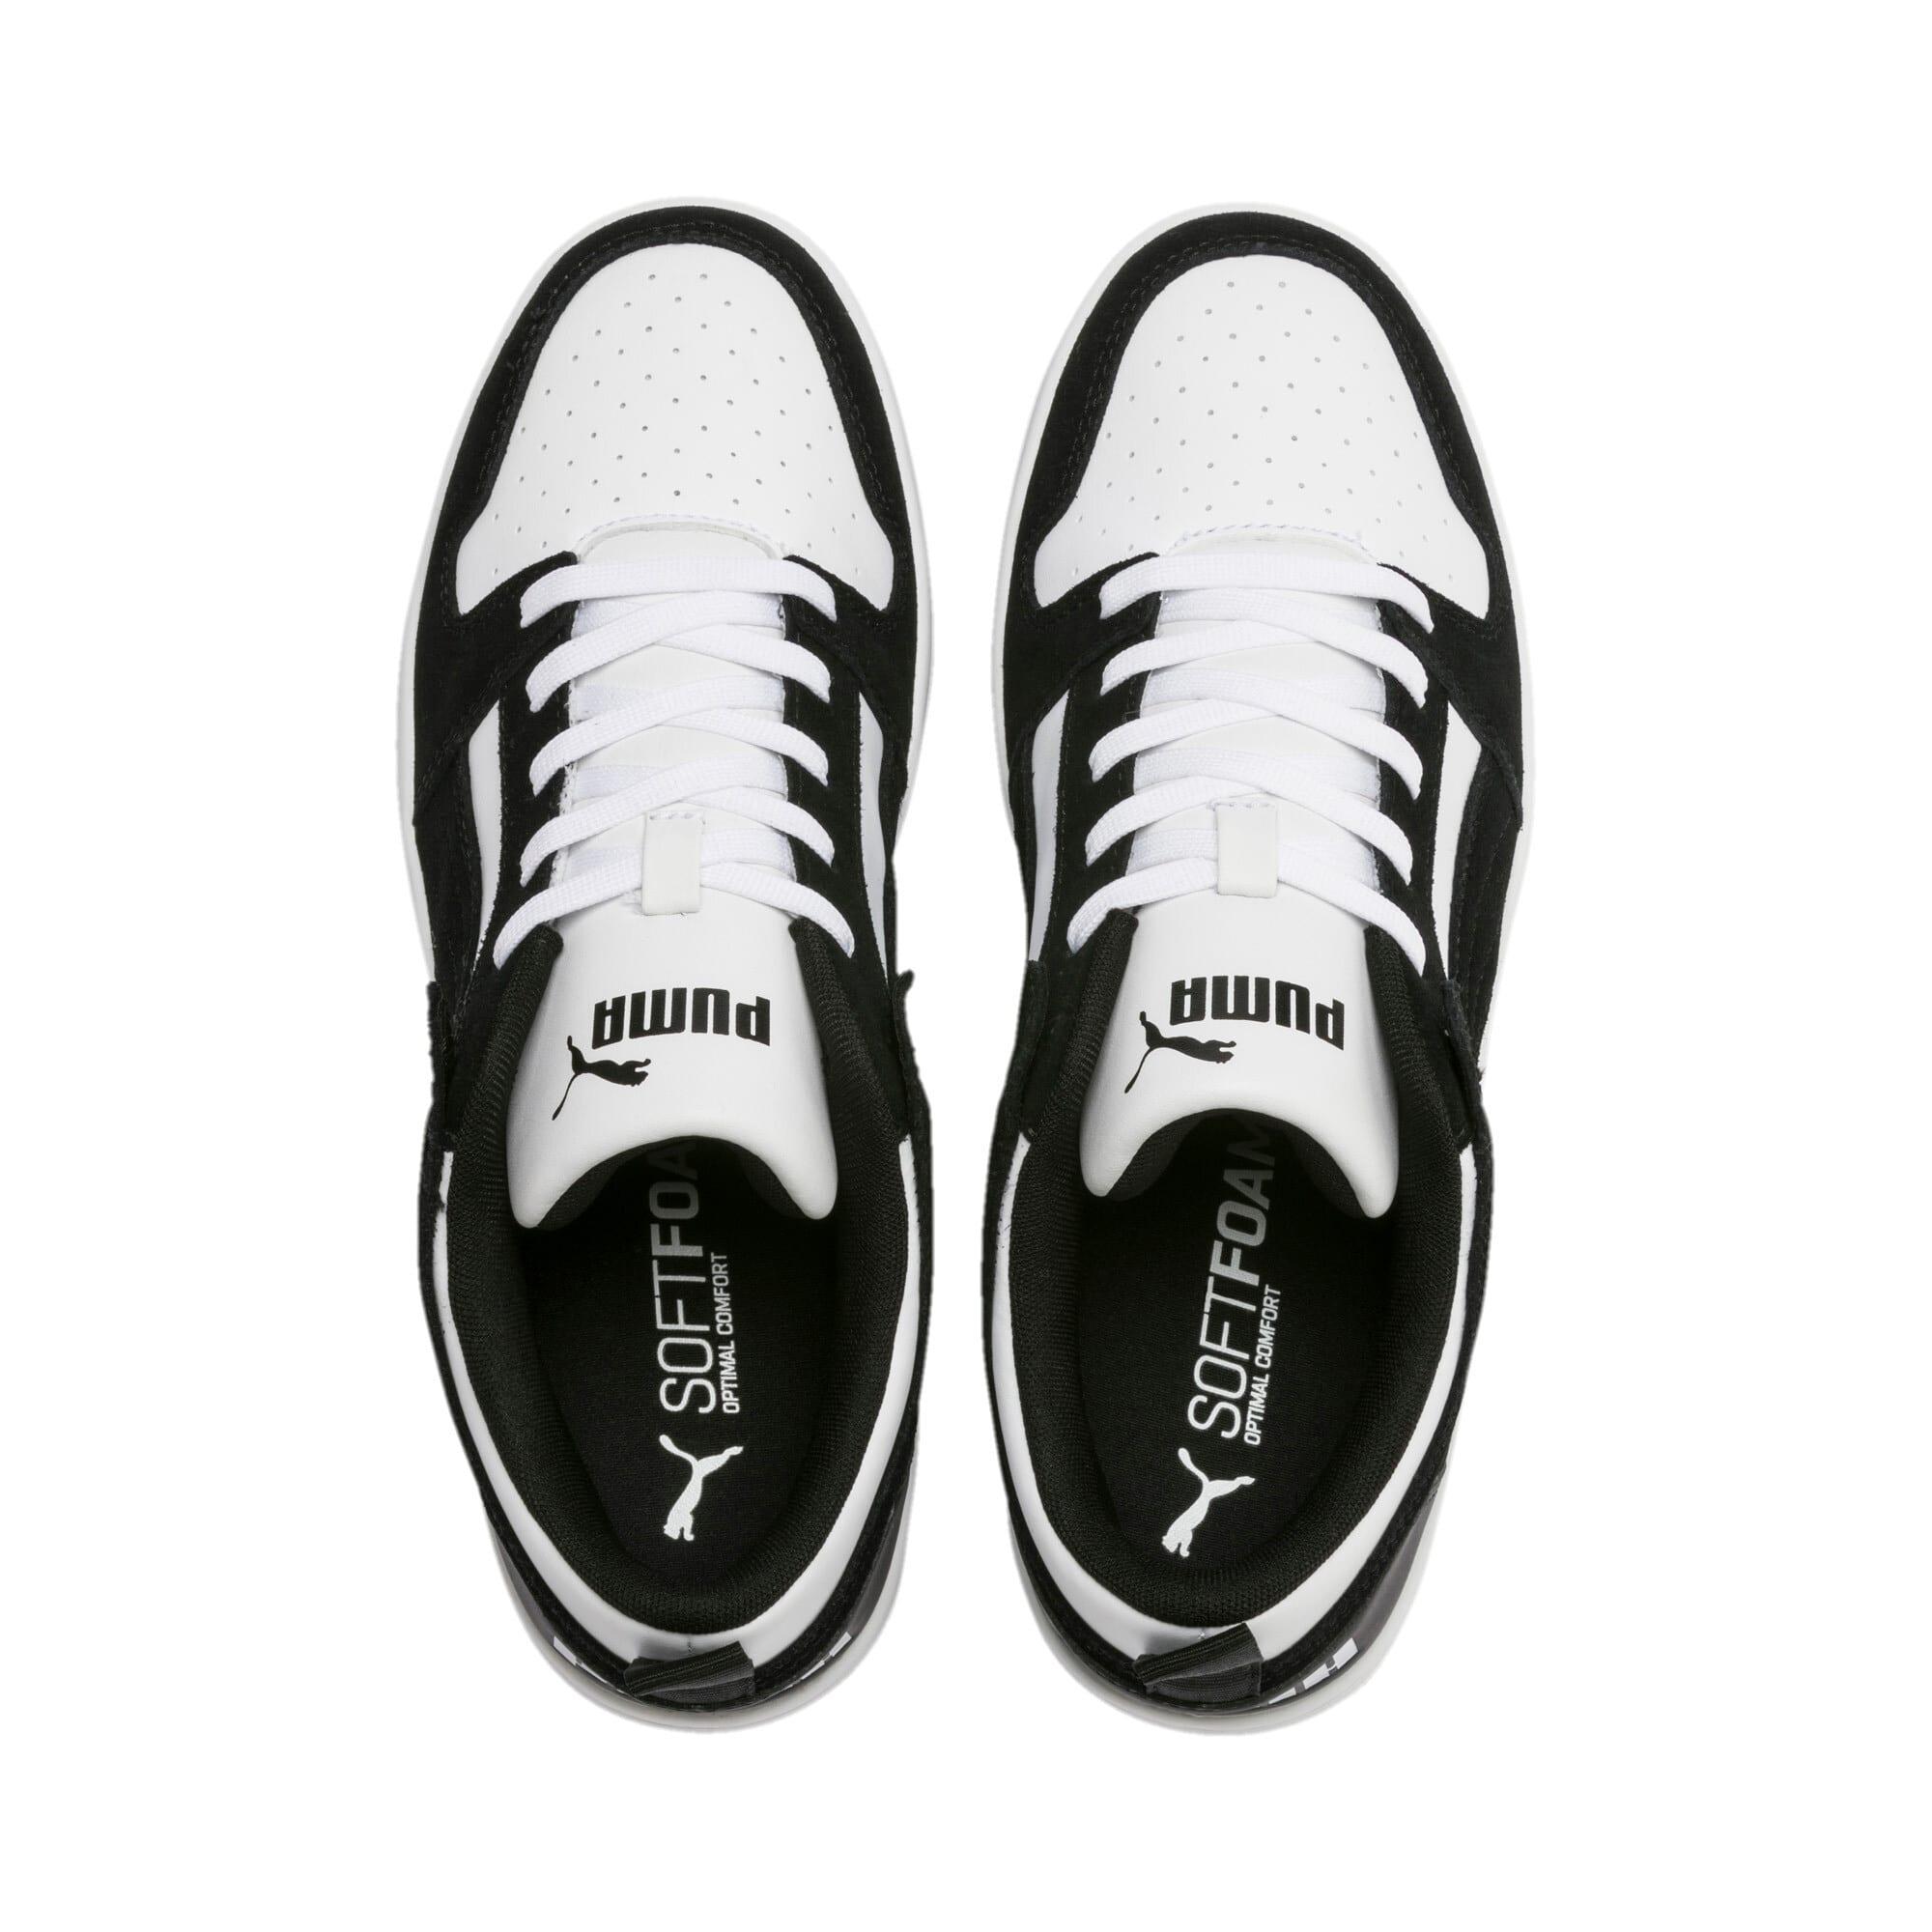 Miniatura 7 de Zapatos deportivos de gamuza PUMA Rebound LayUpLo, Puma Black-Puma White, mediano